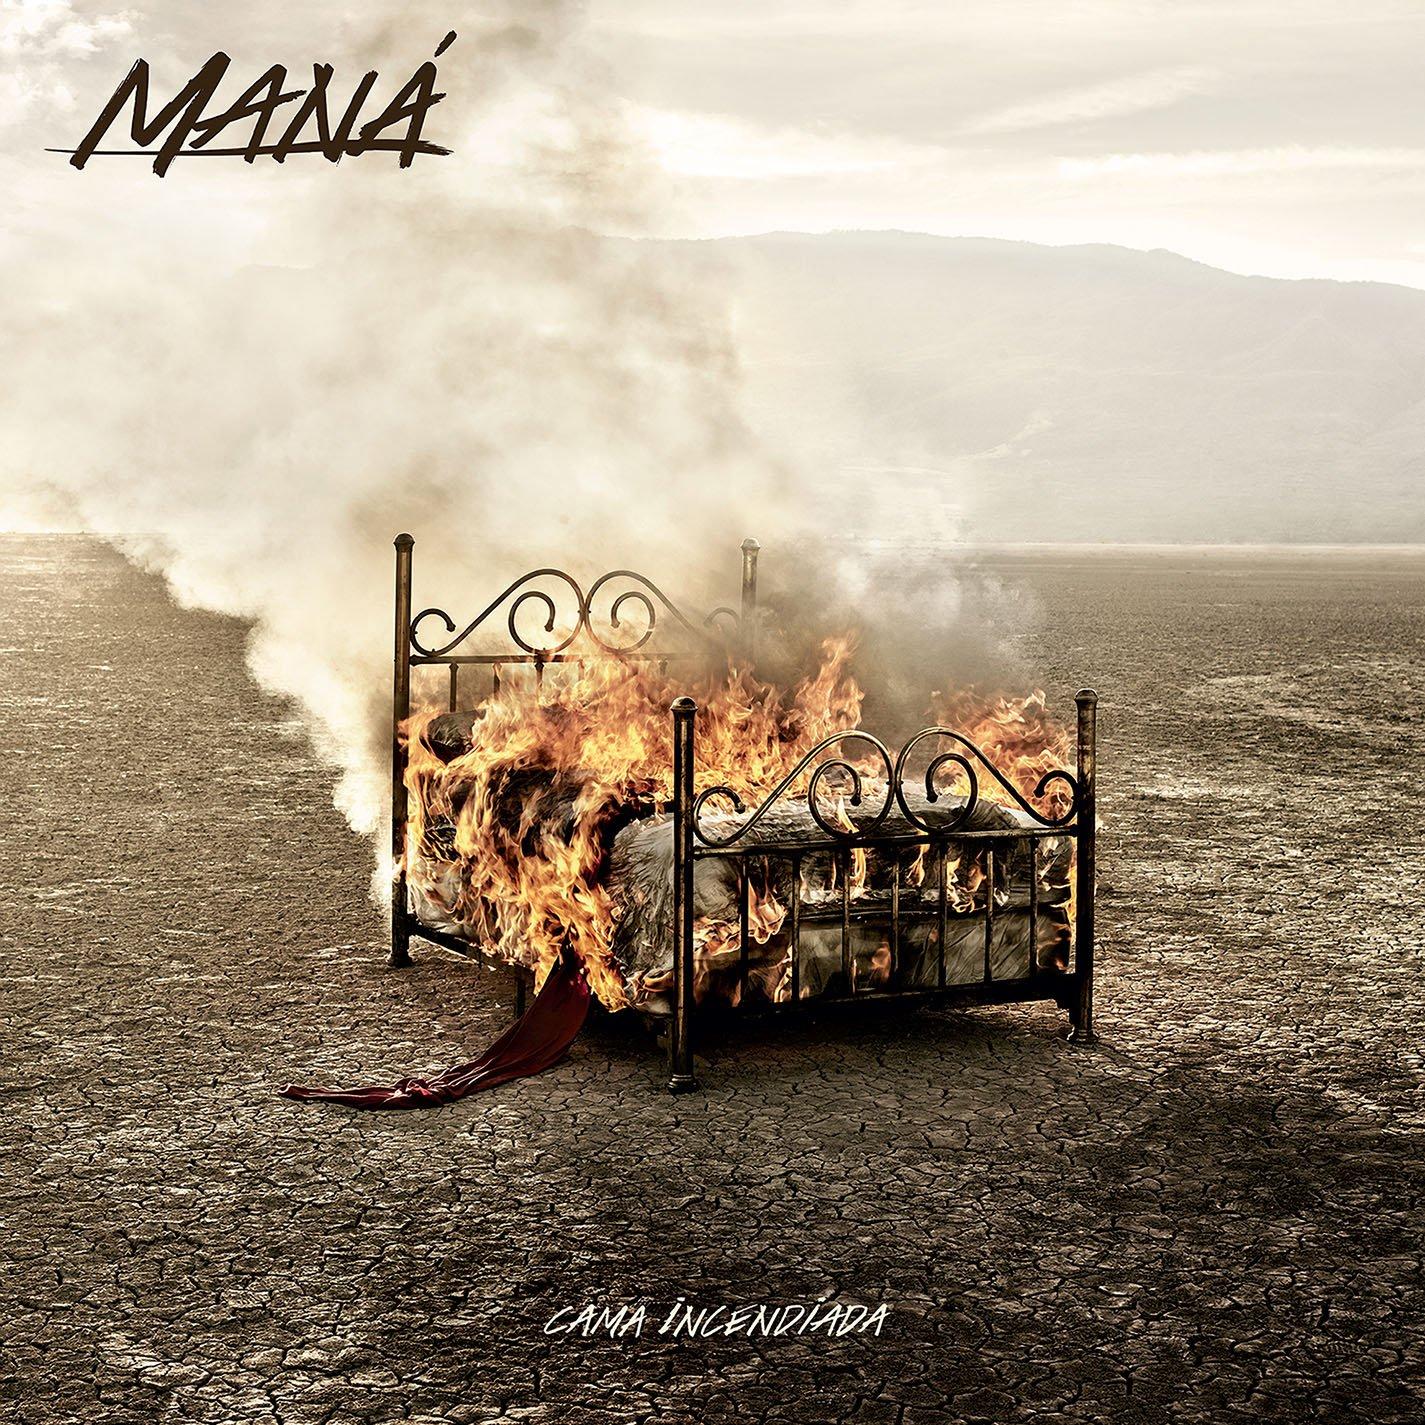 Vinilo : Mana - Cama Incendiada (LP Vinyl)